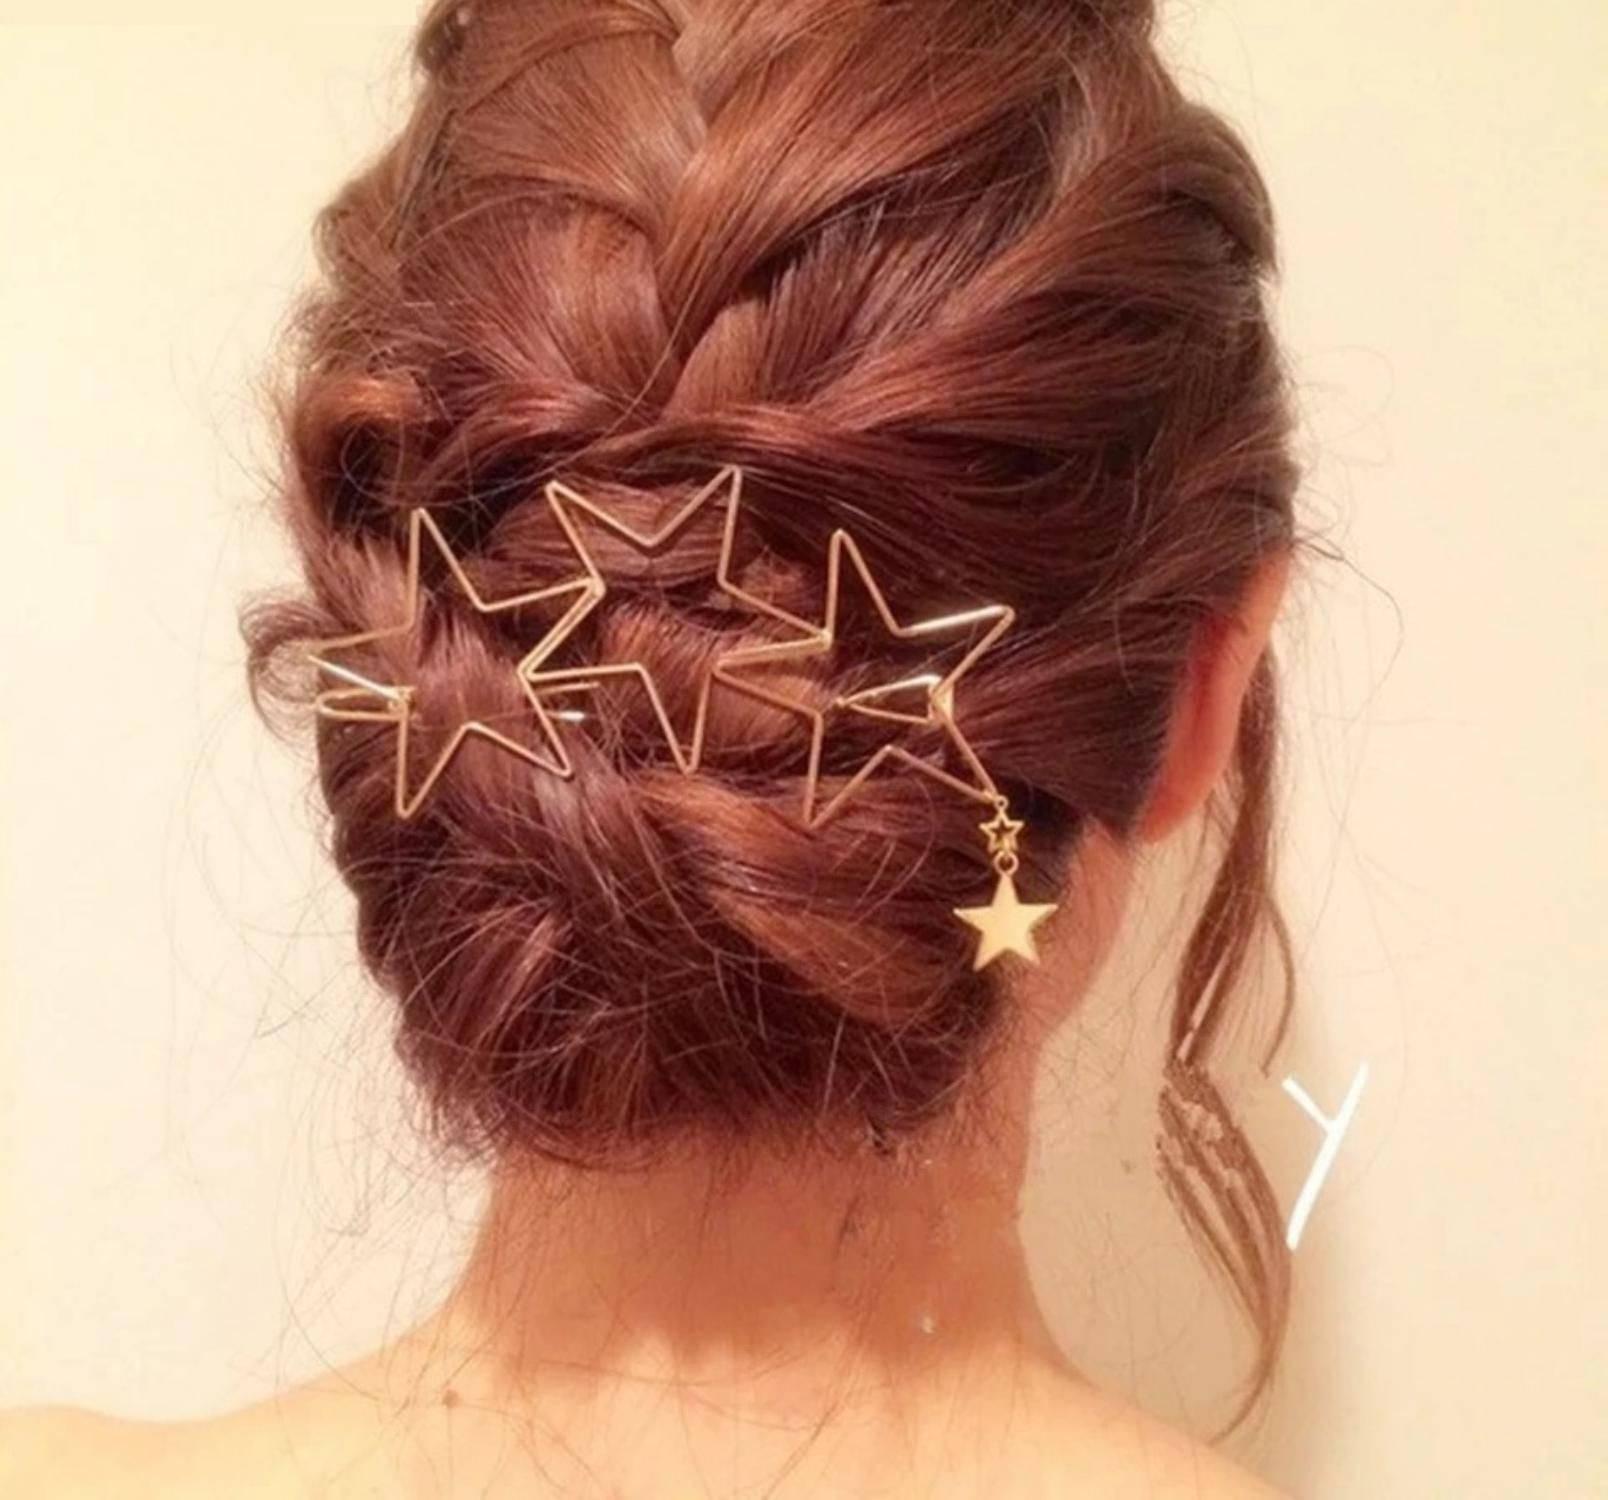 Stylish Teens Gold Party Hair SDL 2 4c7d5